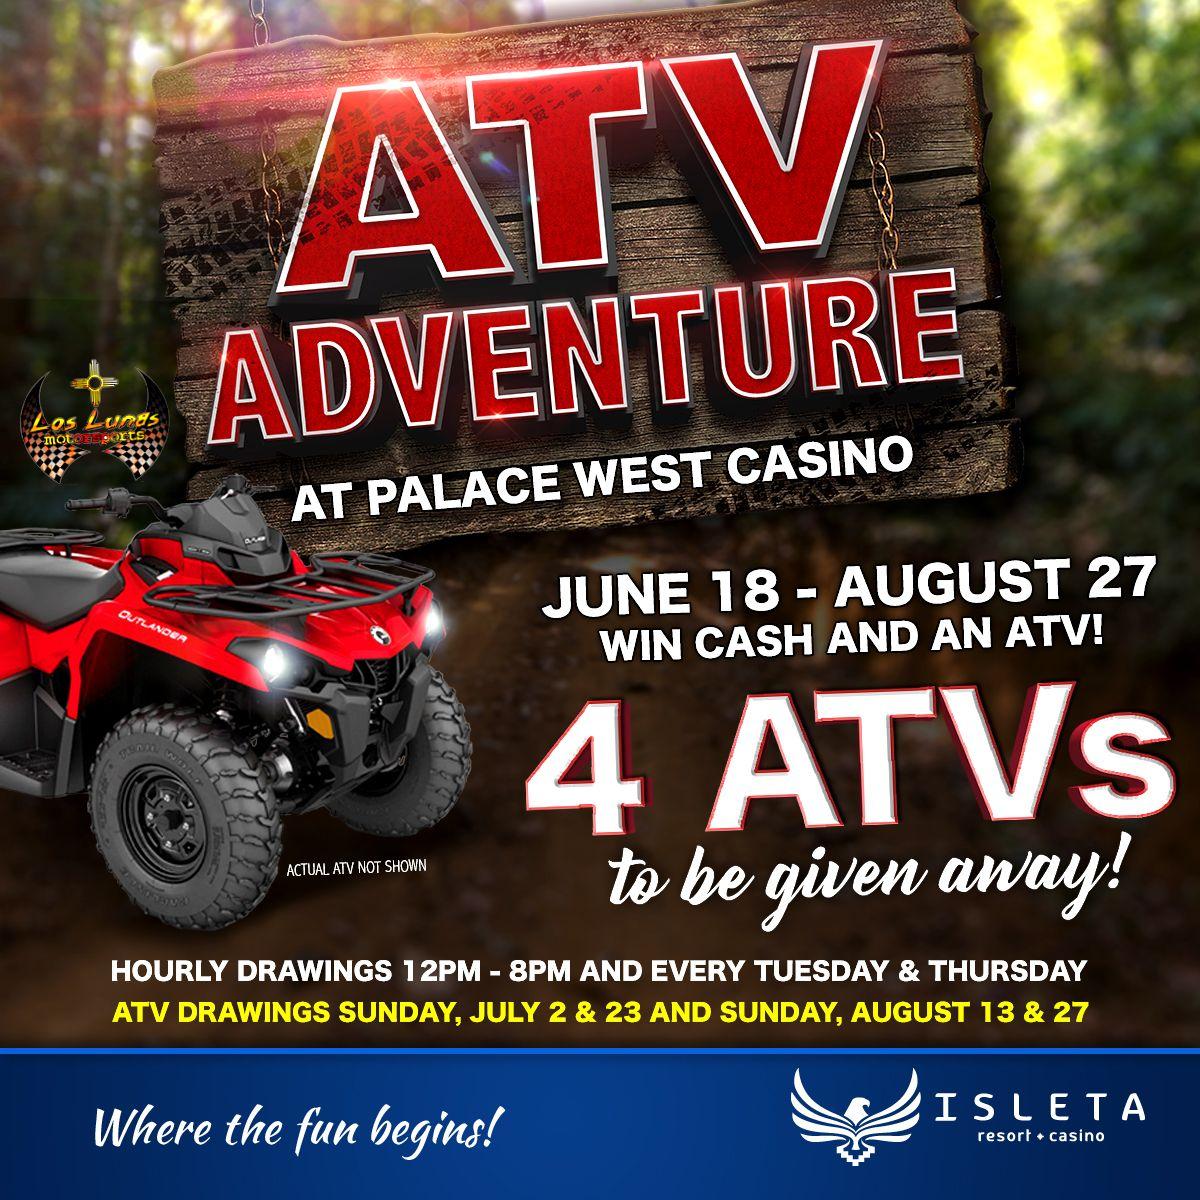 Atv resort casino casino falls in new niagara ontario